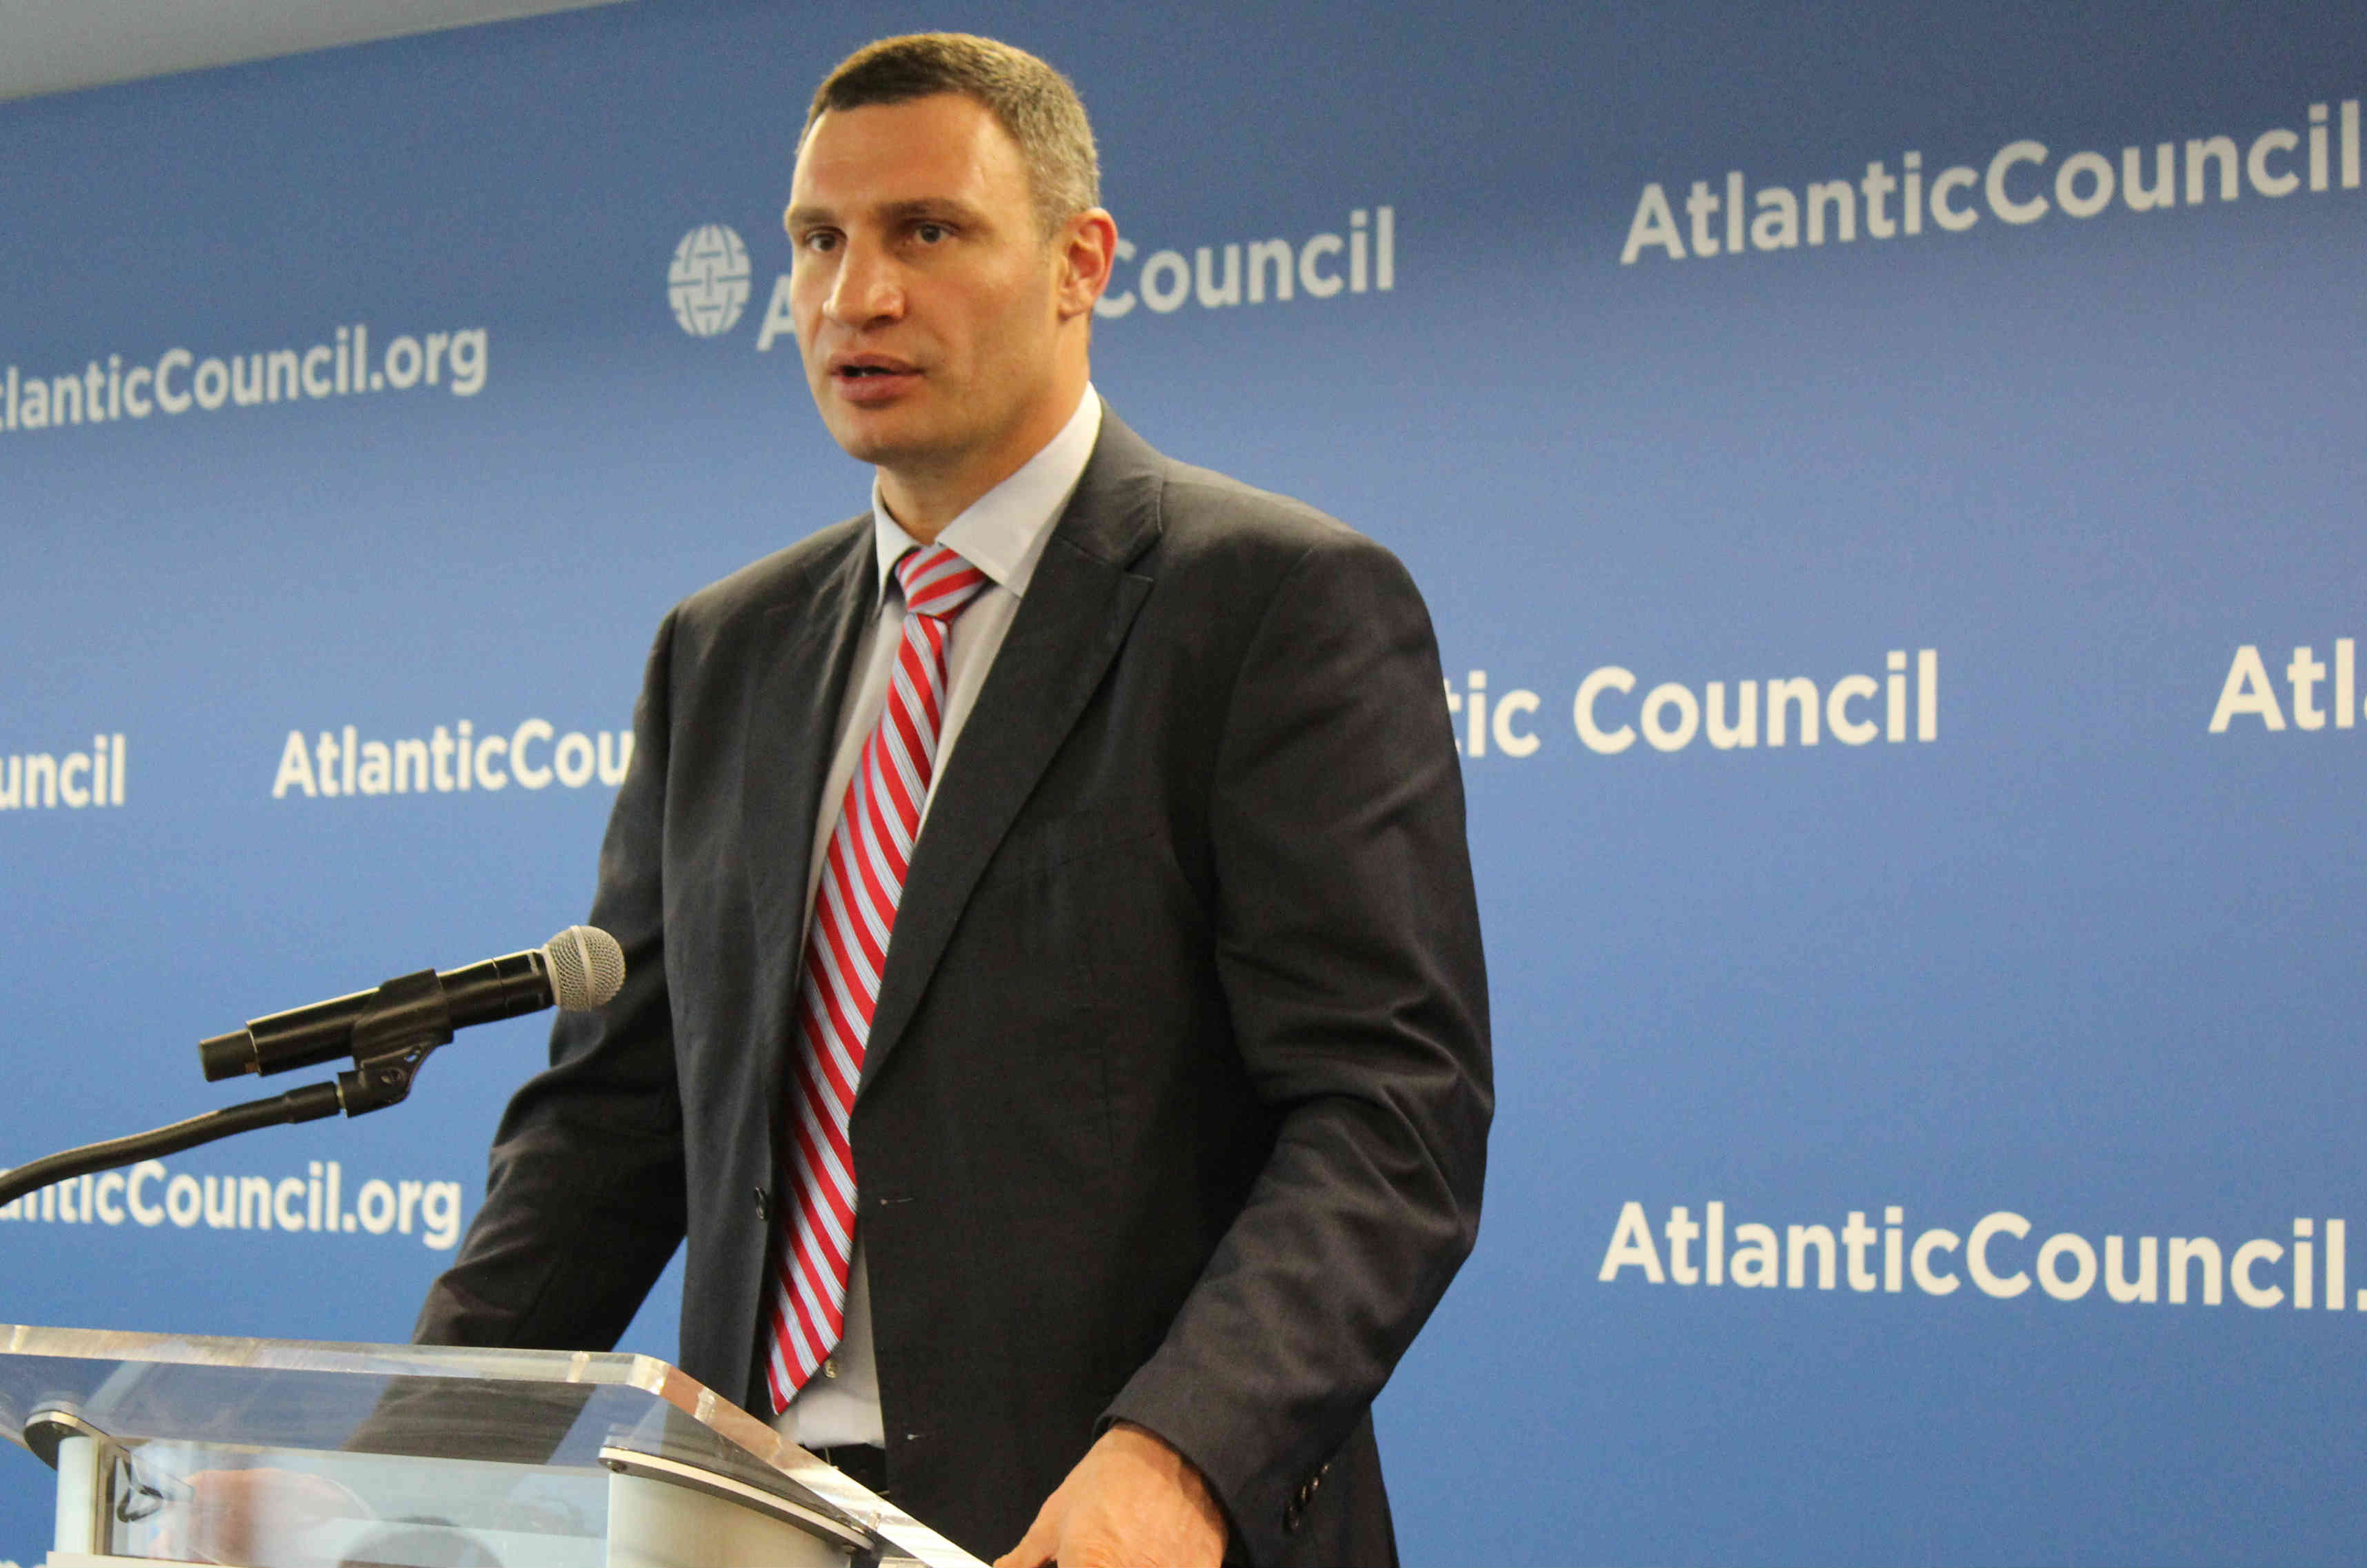 Klitschko: Economic Success Will Unite Country